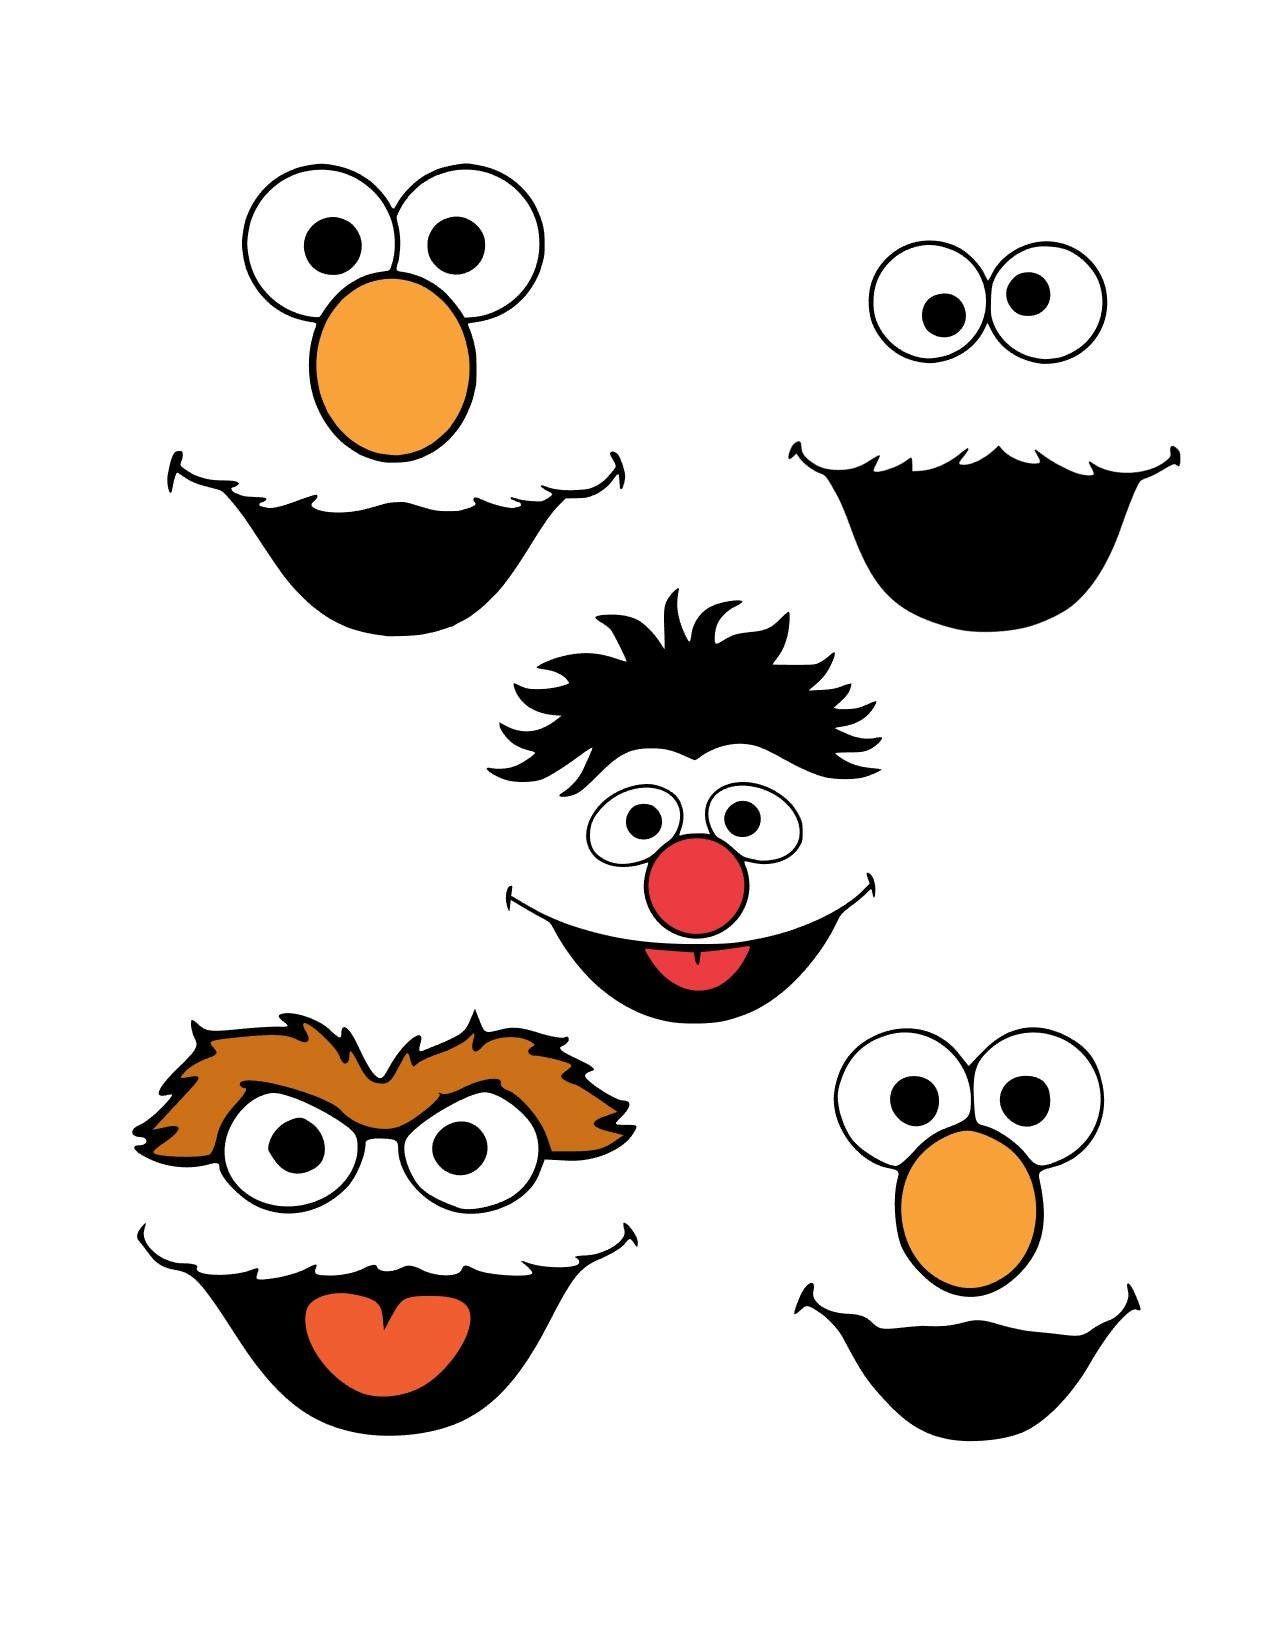 Sesame Street Christmas 2019 Pin by Rhonda Trout on Trunk Sesame Street 2017 in 2019 | Sesame